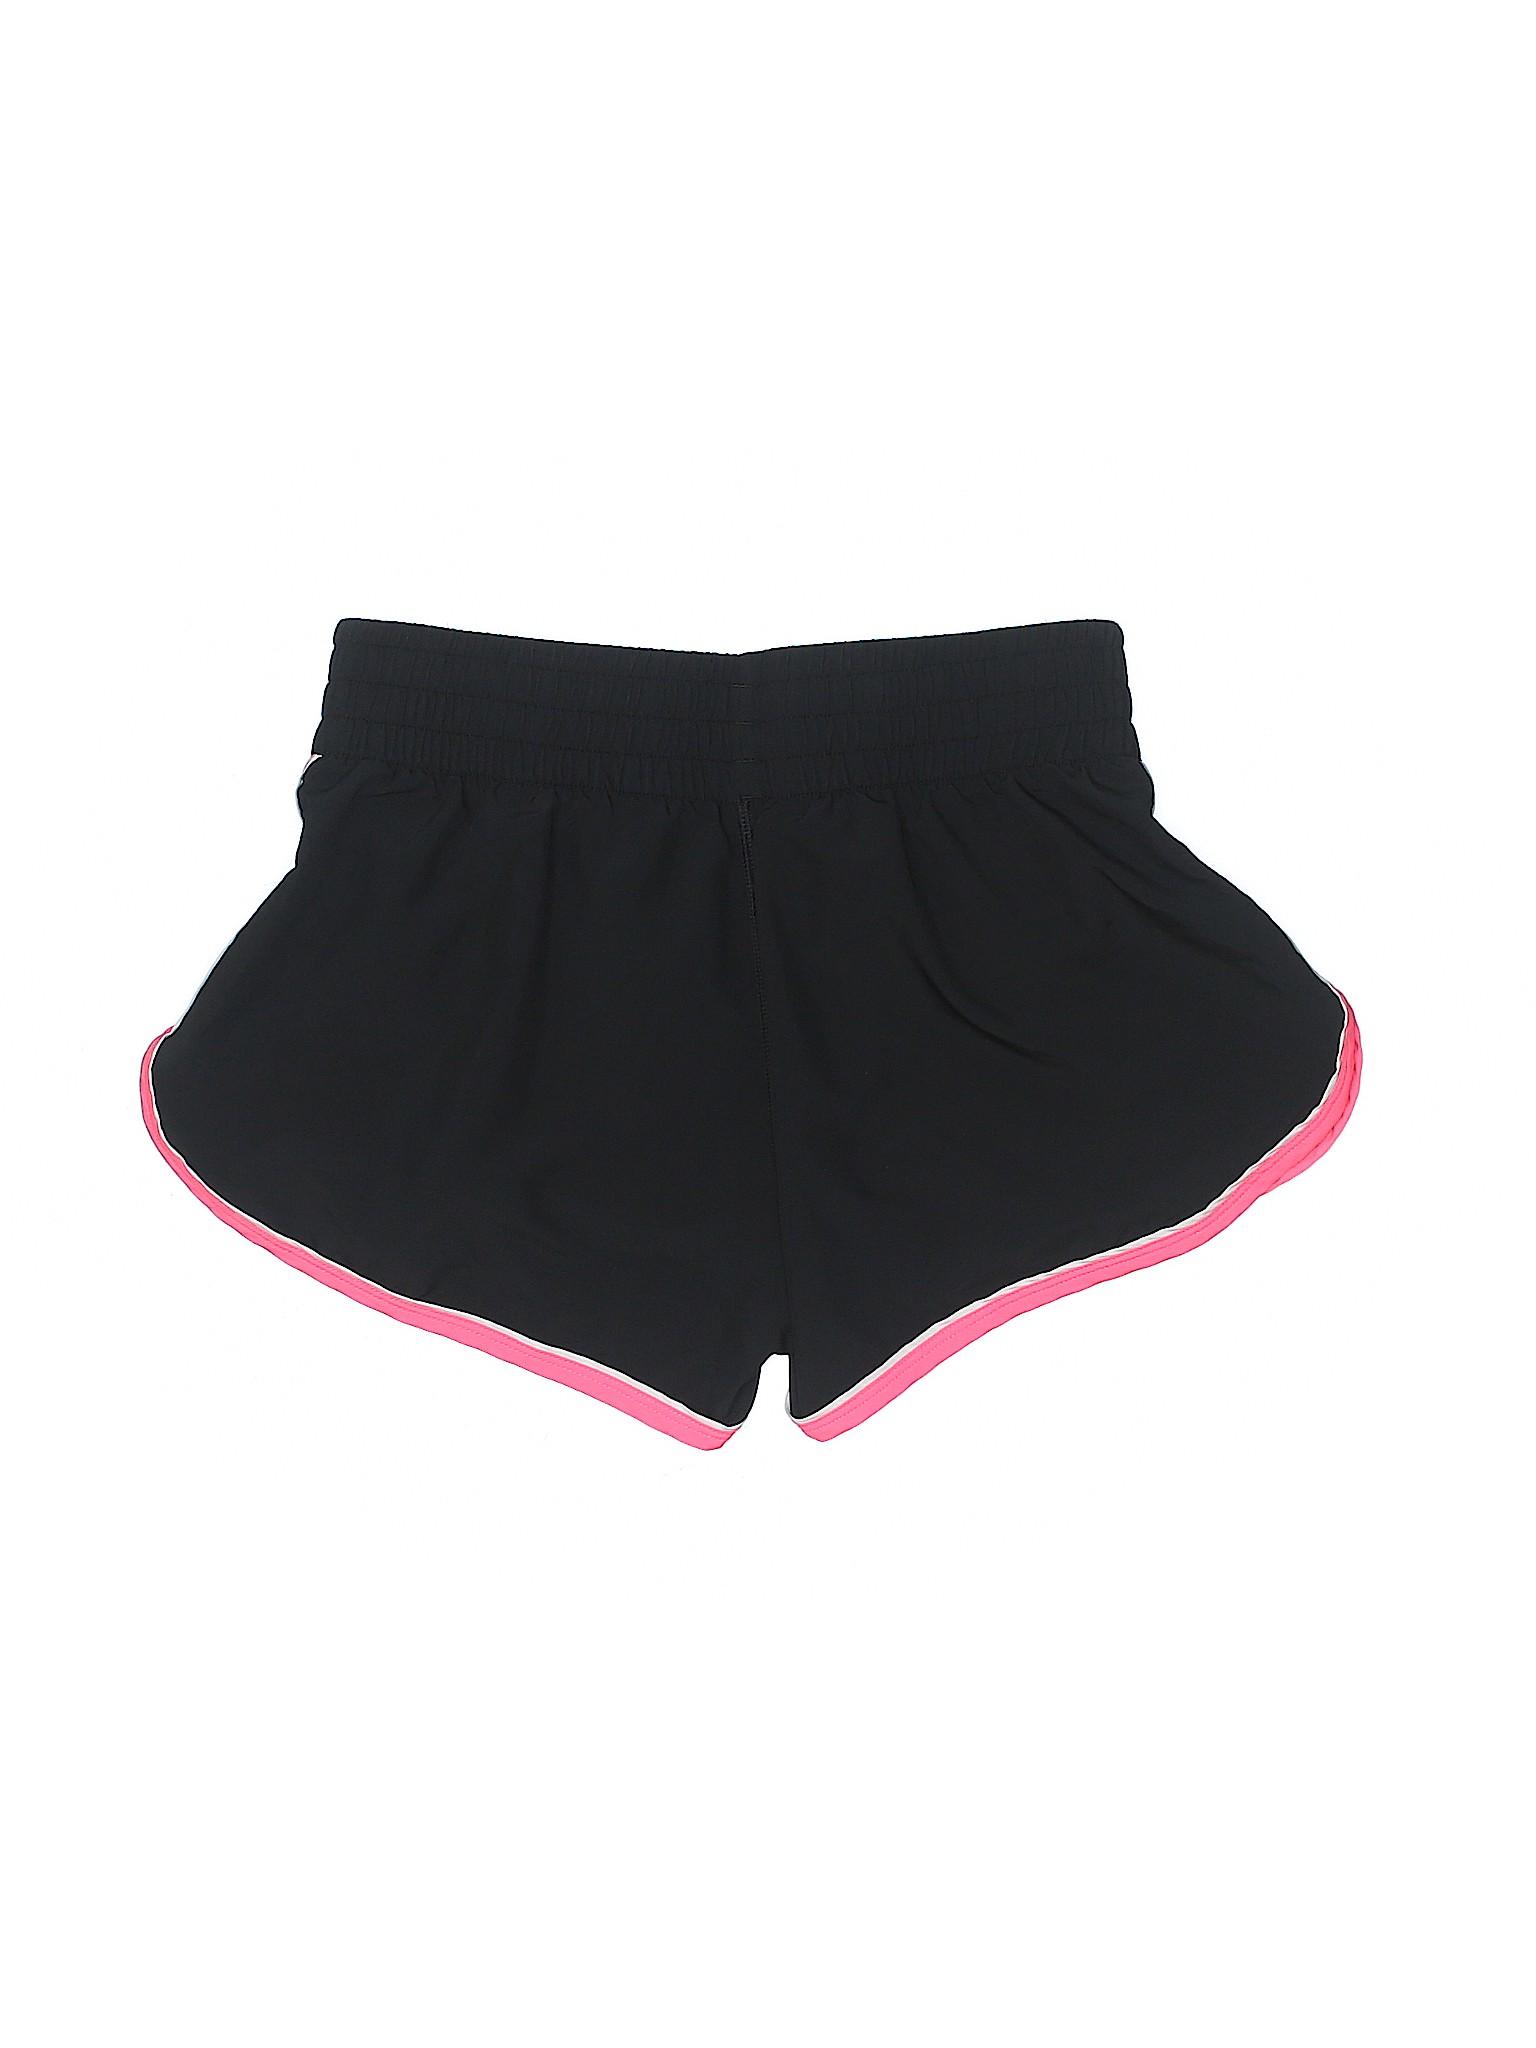 Shorts Athletic Boutique Armour Under Armour Boutique Under HYXZHw